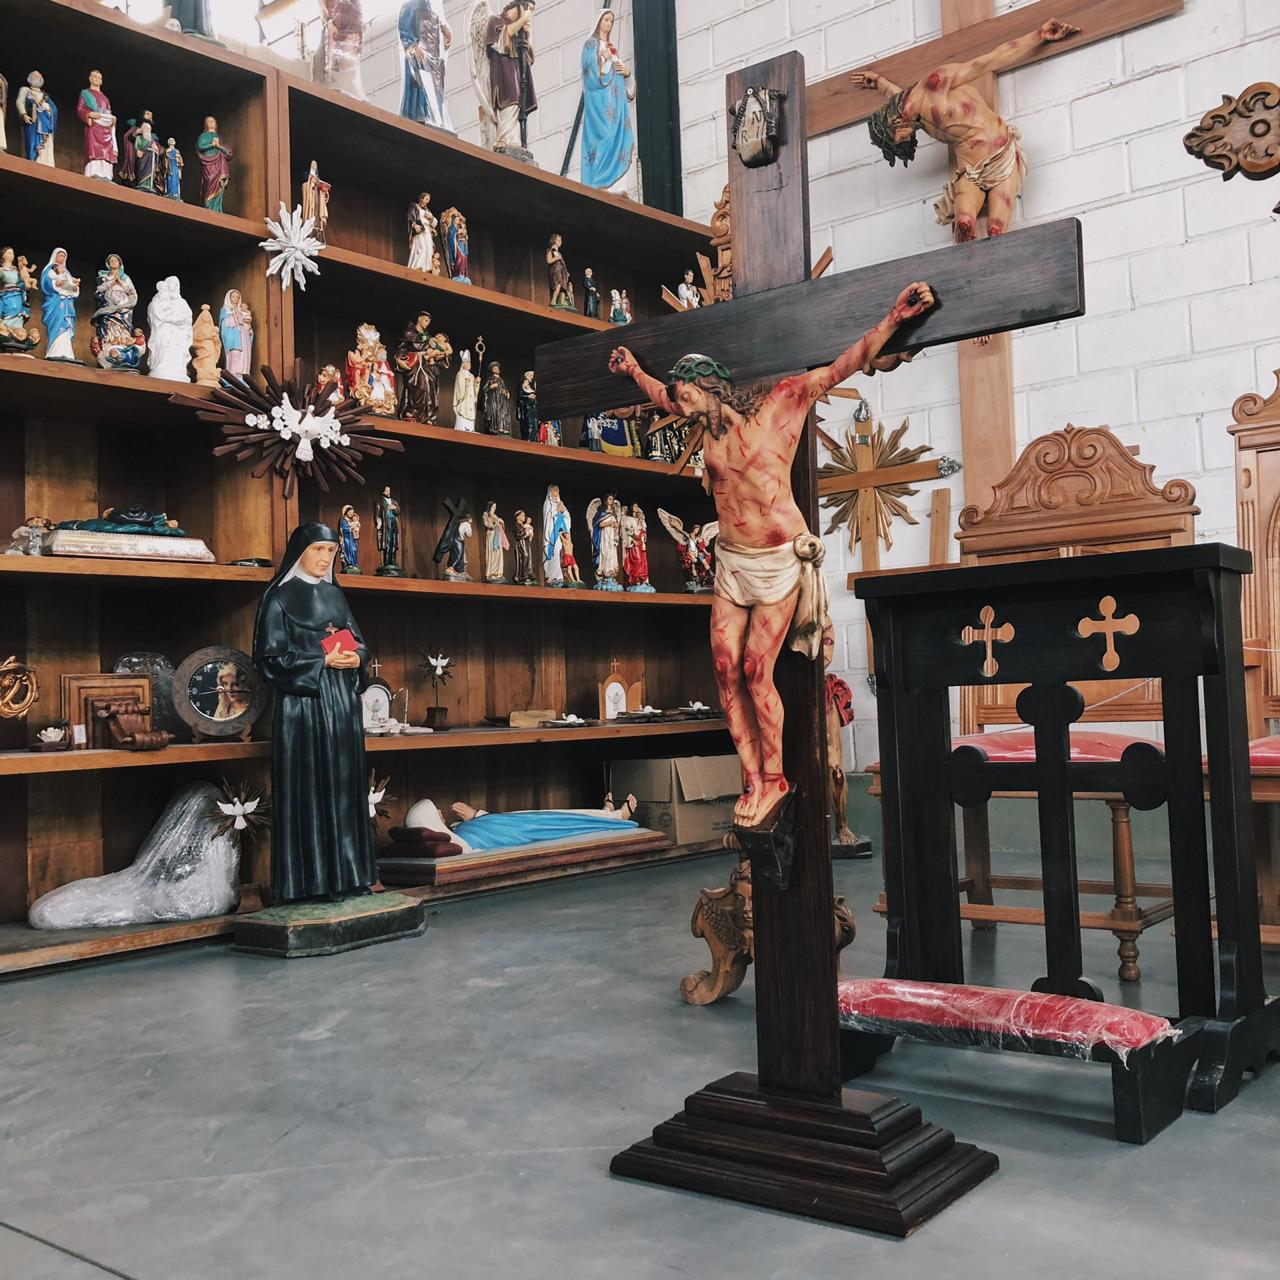 Crucifixo (chagado) - Crucifixo: 150 cm | Corpo: 70 cm (com base)